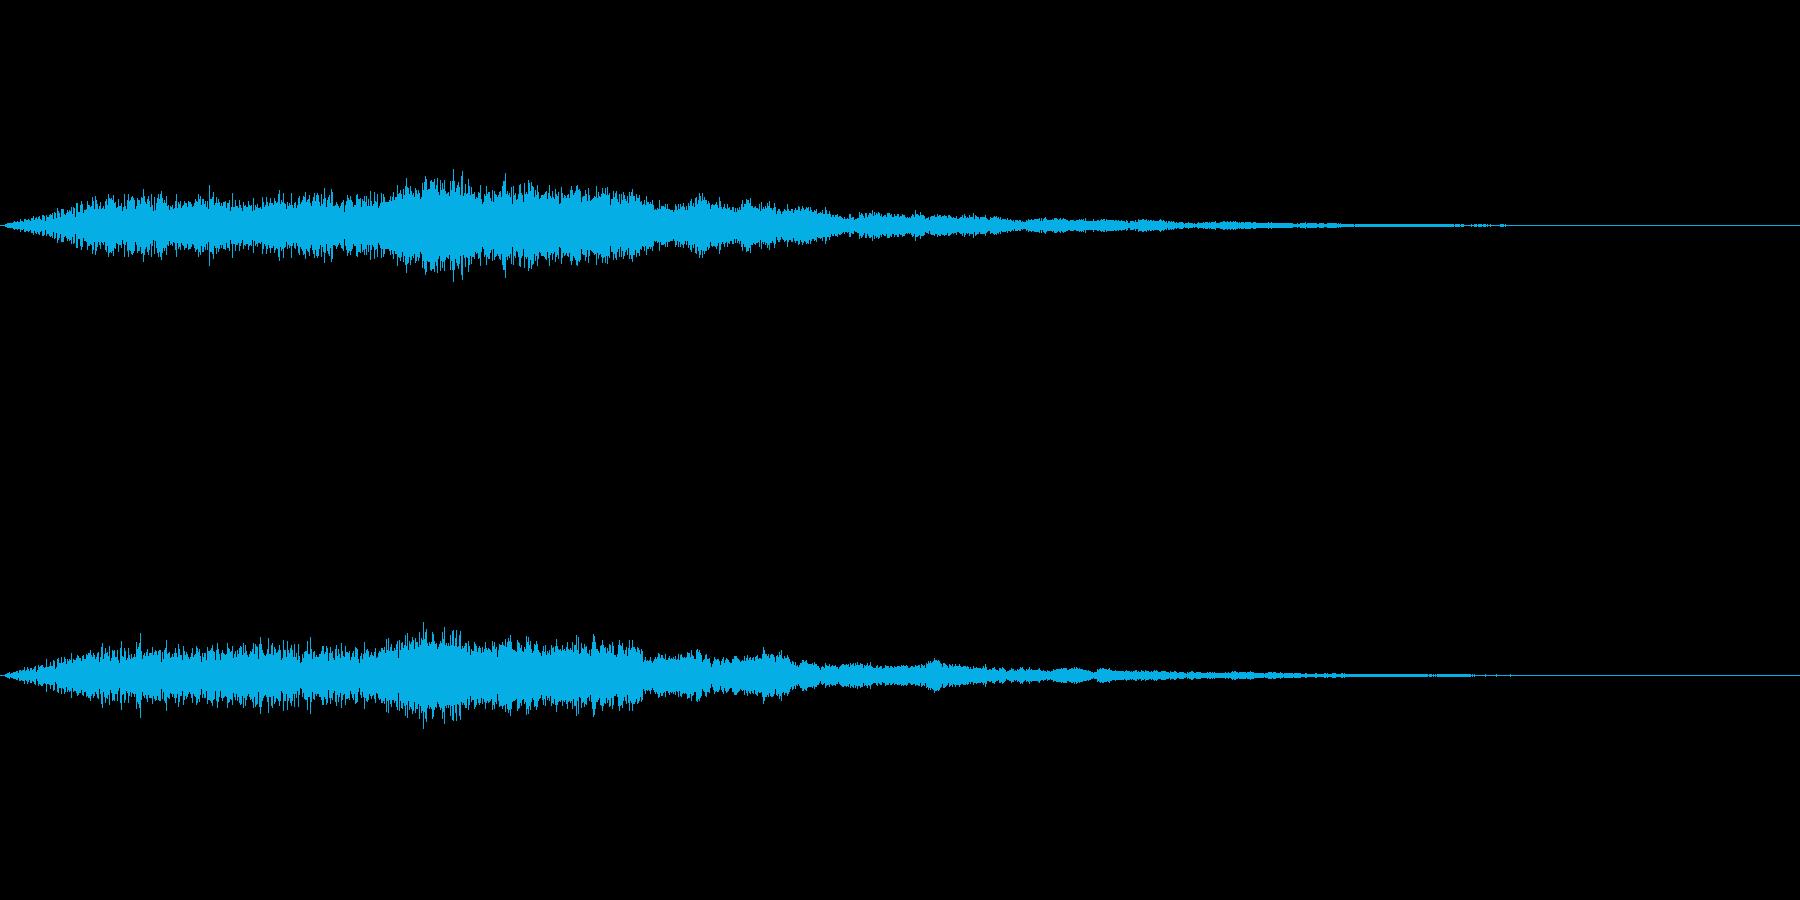 【SE 効果音】奇妙な音2の再生済みの波形